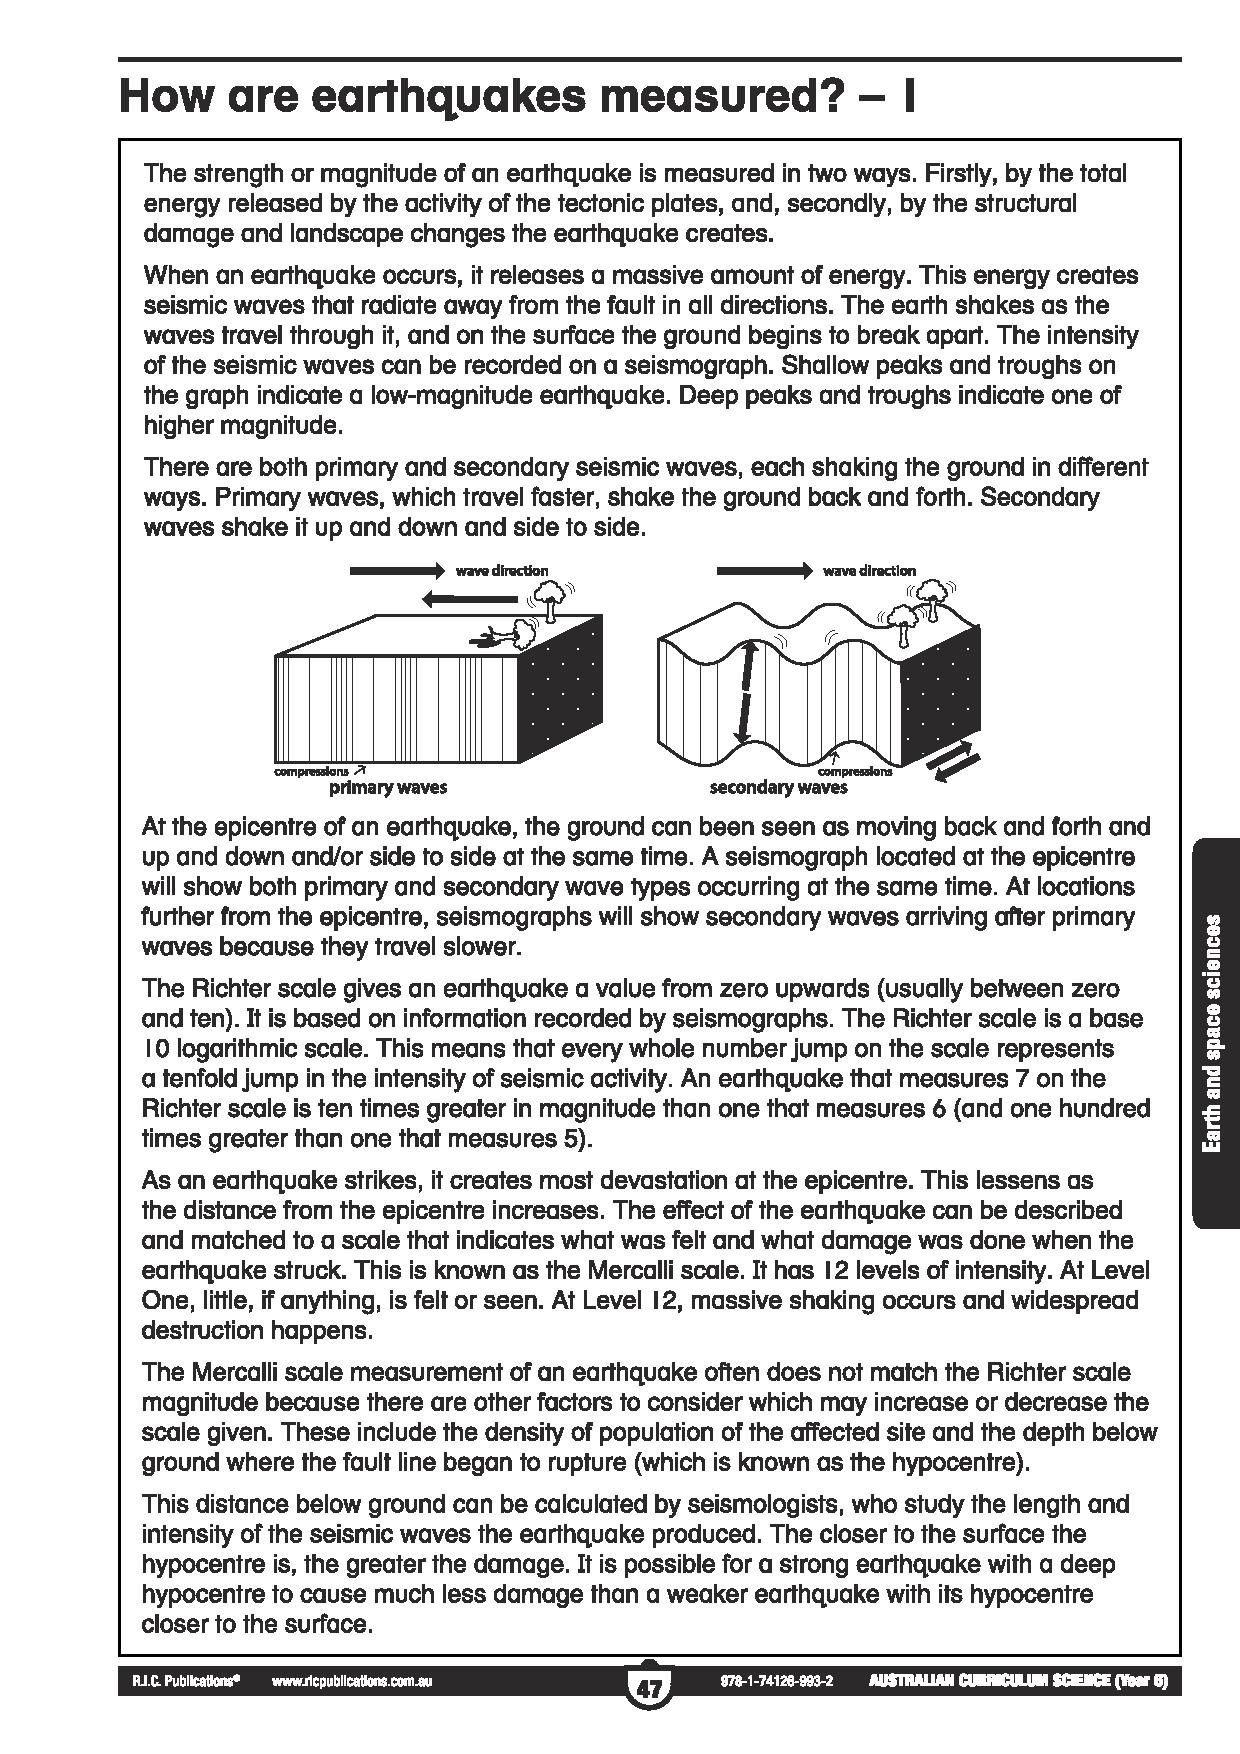 Pin On Australian Curriculum Science